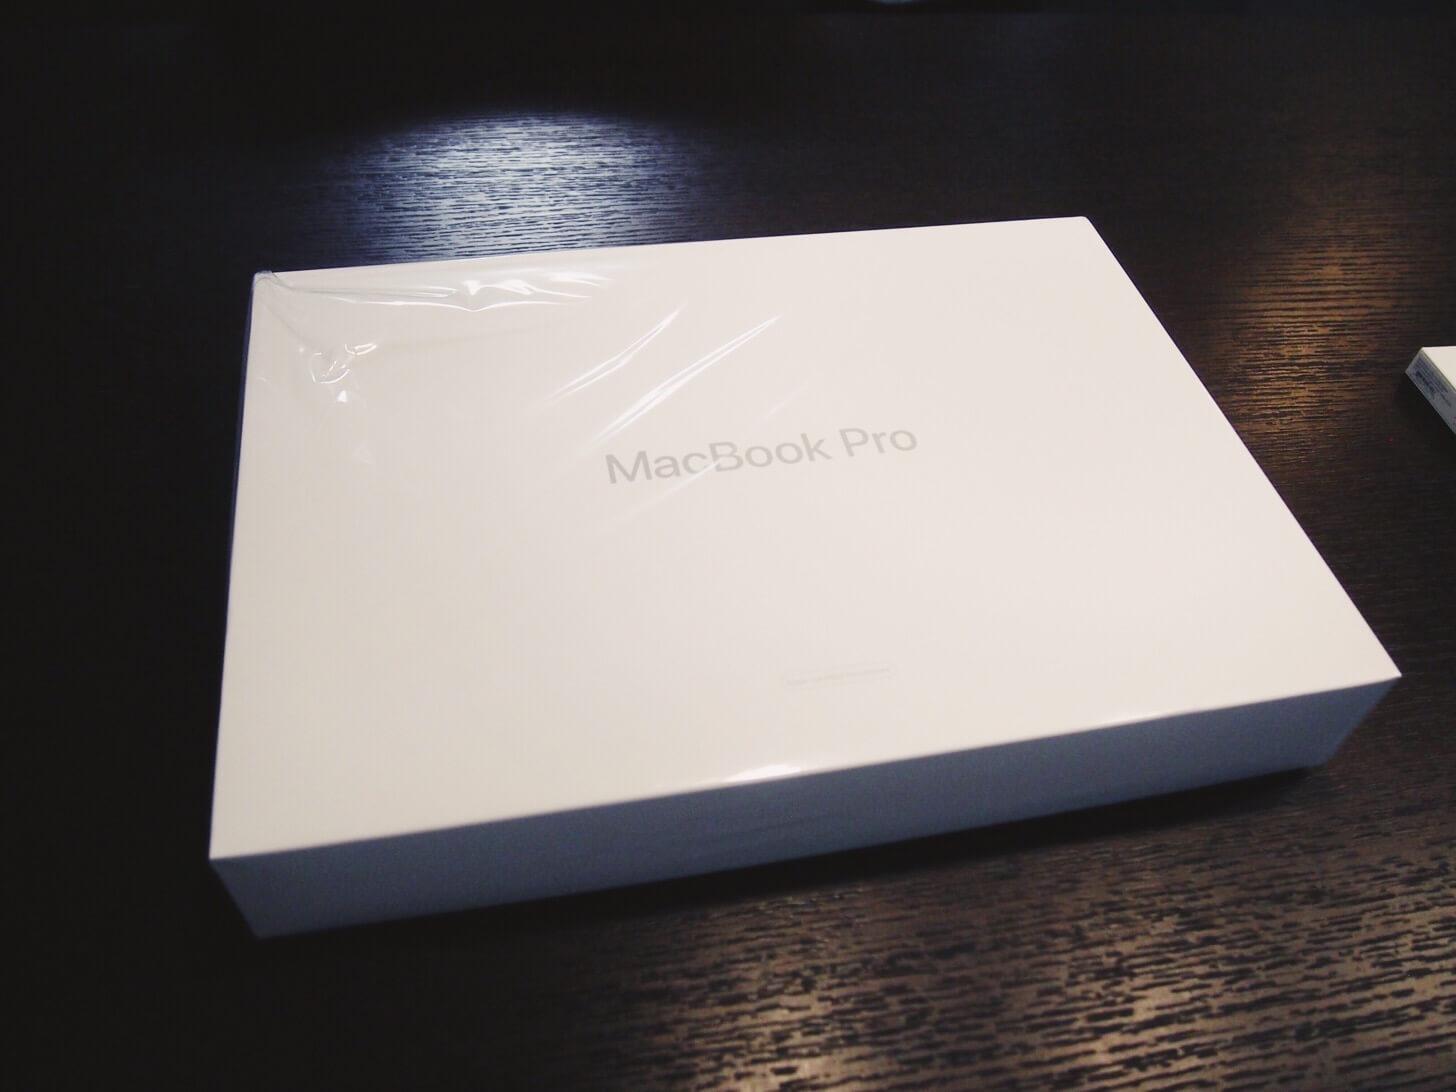 macbookpro2016-15inch-2